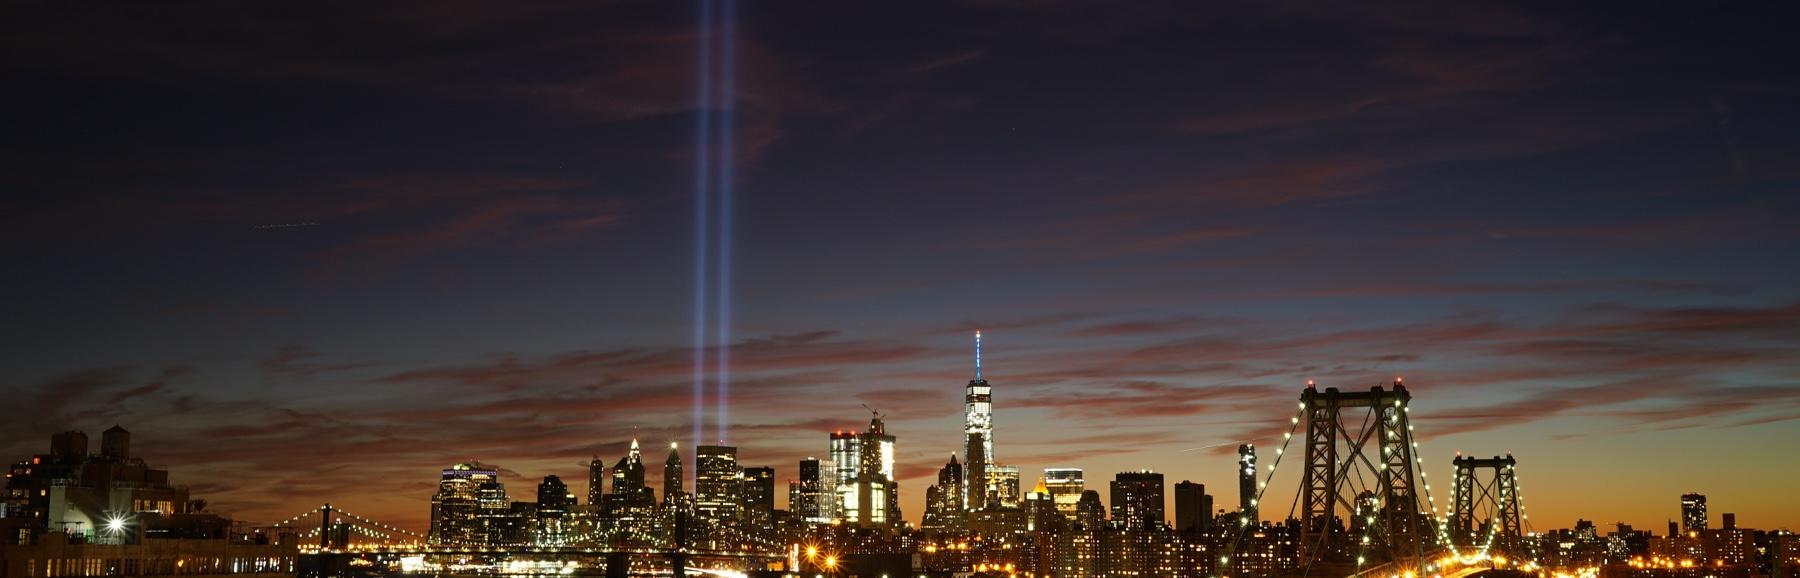 The Economic Landscape After Sept. 11